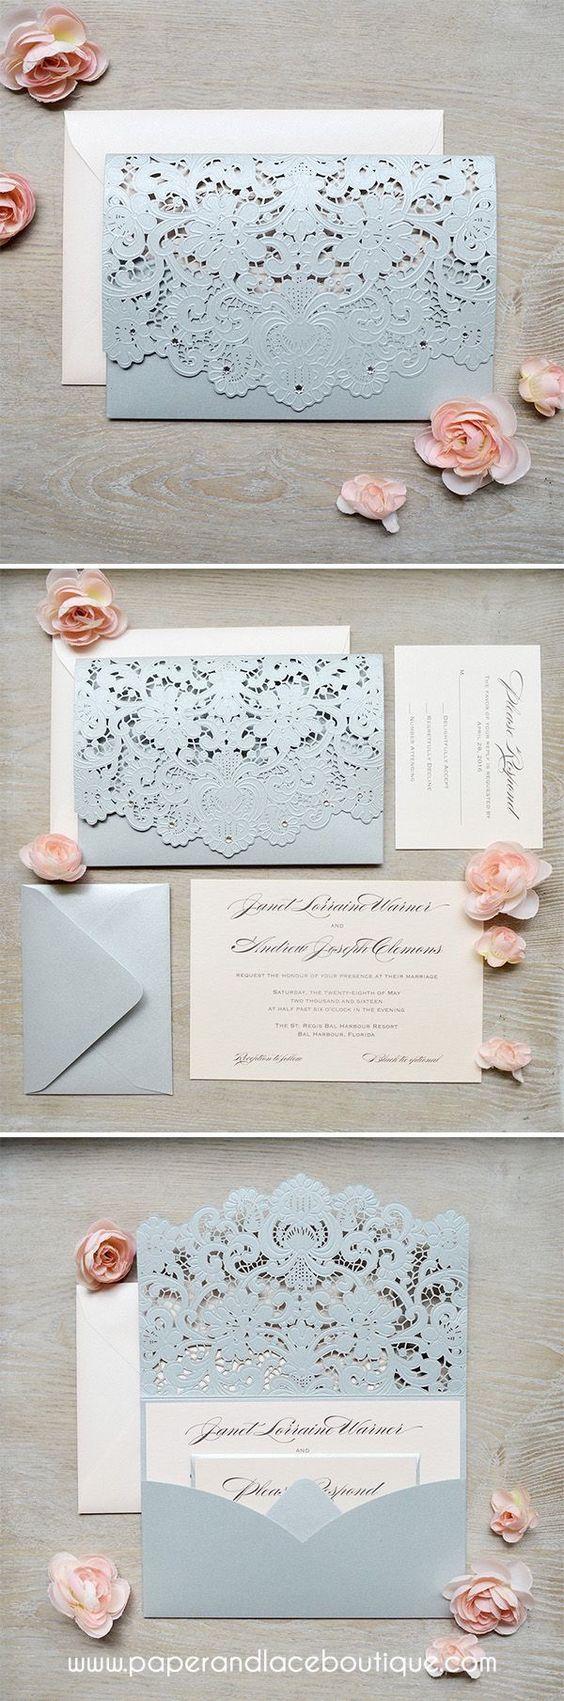 best images about esküvő on pinterest